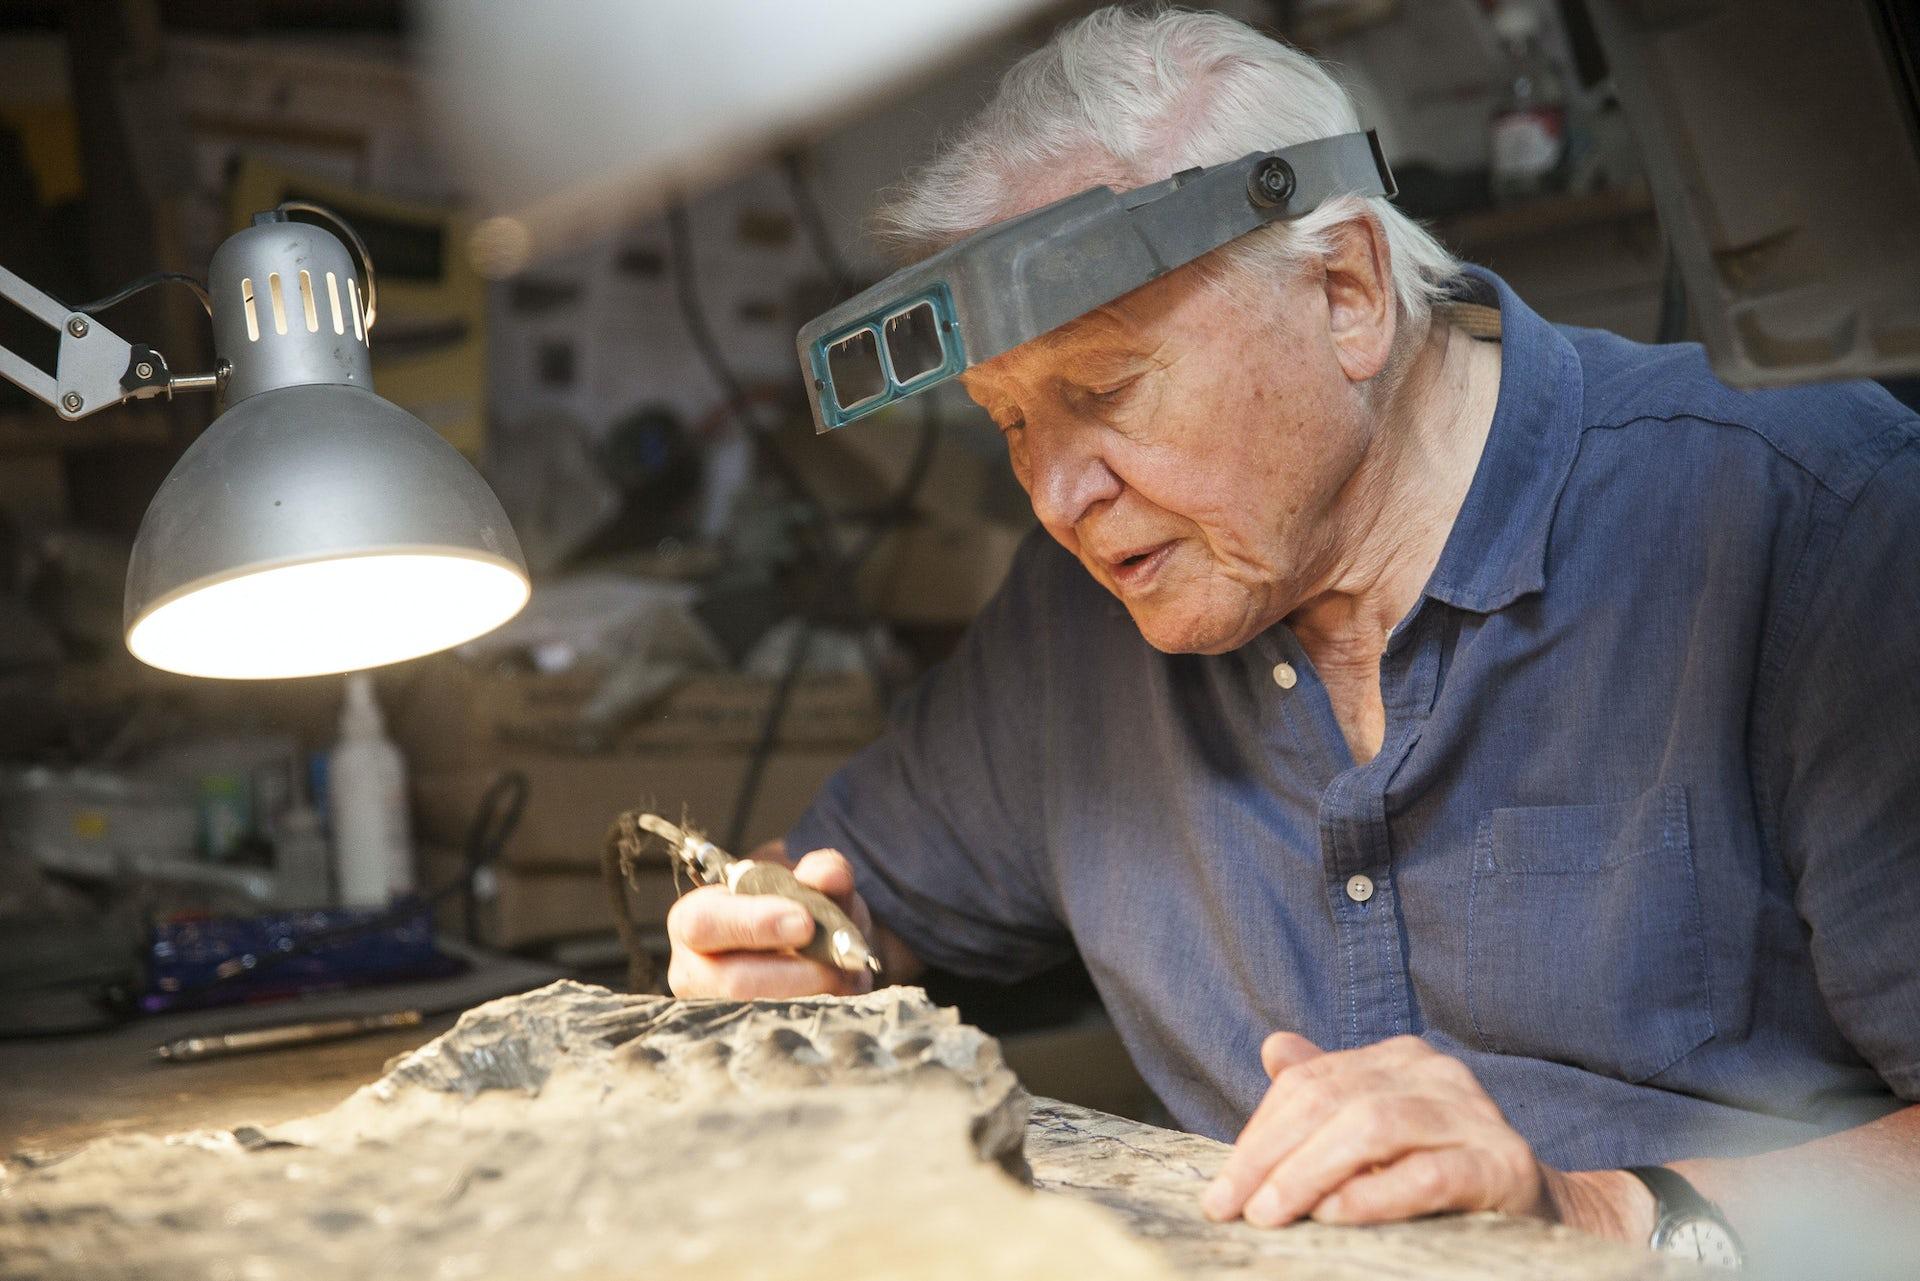 Sir David Attenborough blasts Bear Grylls for killing animals on TV show